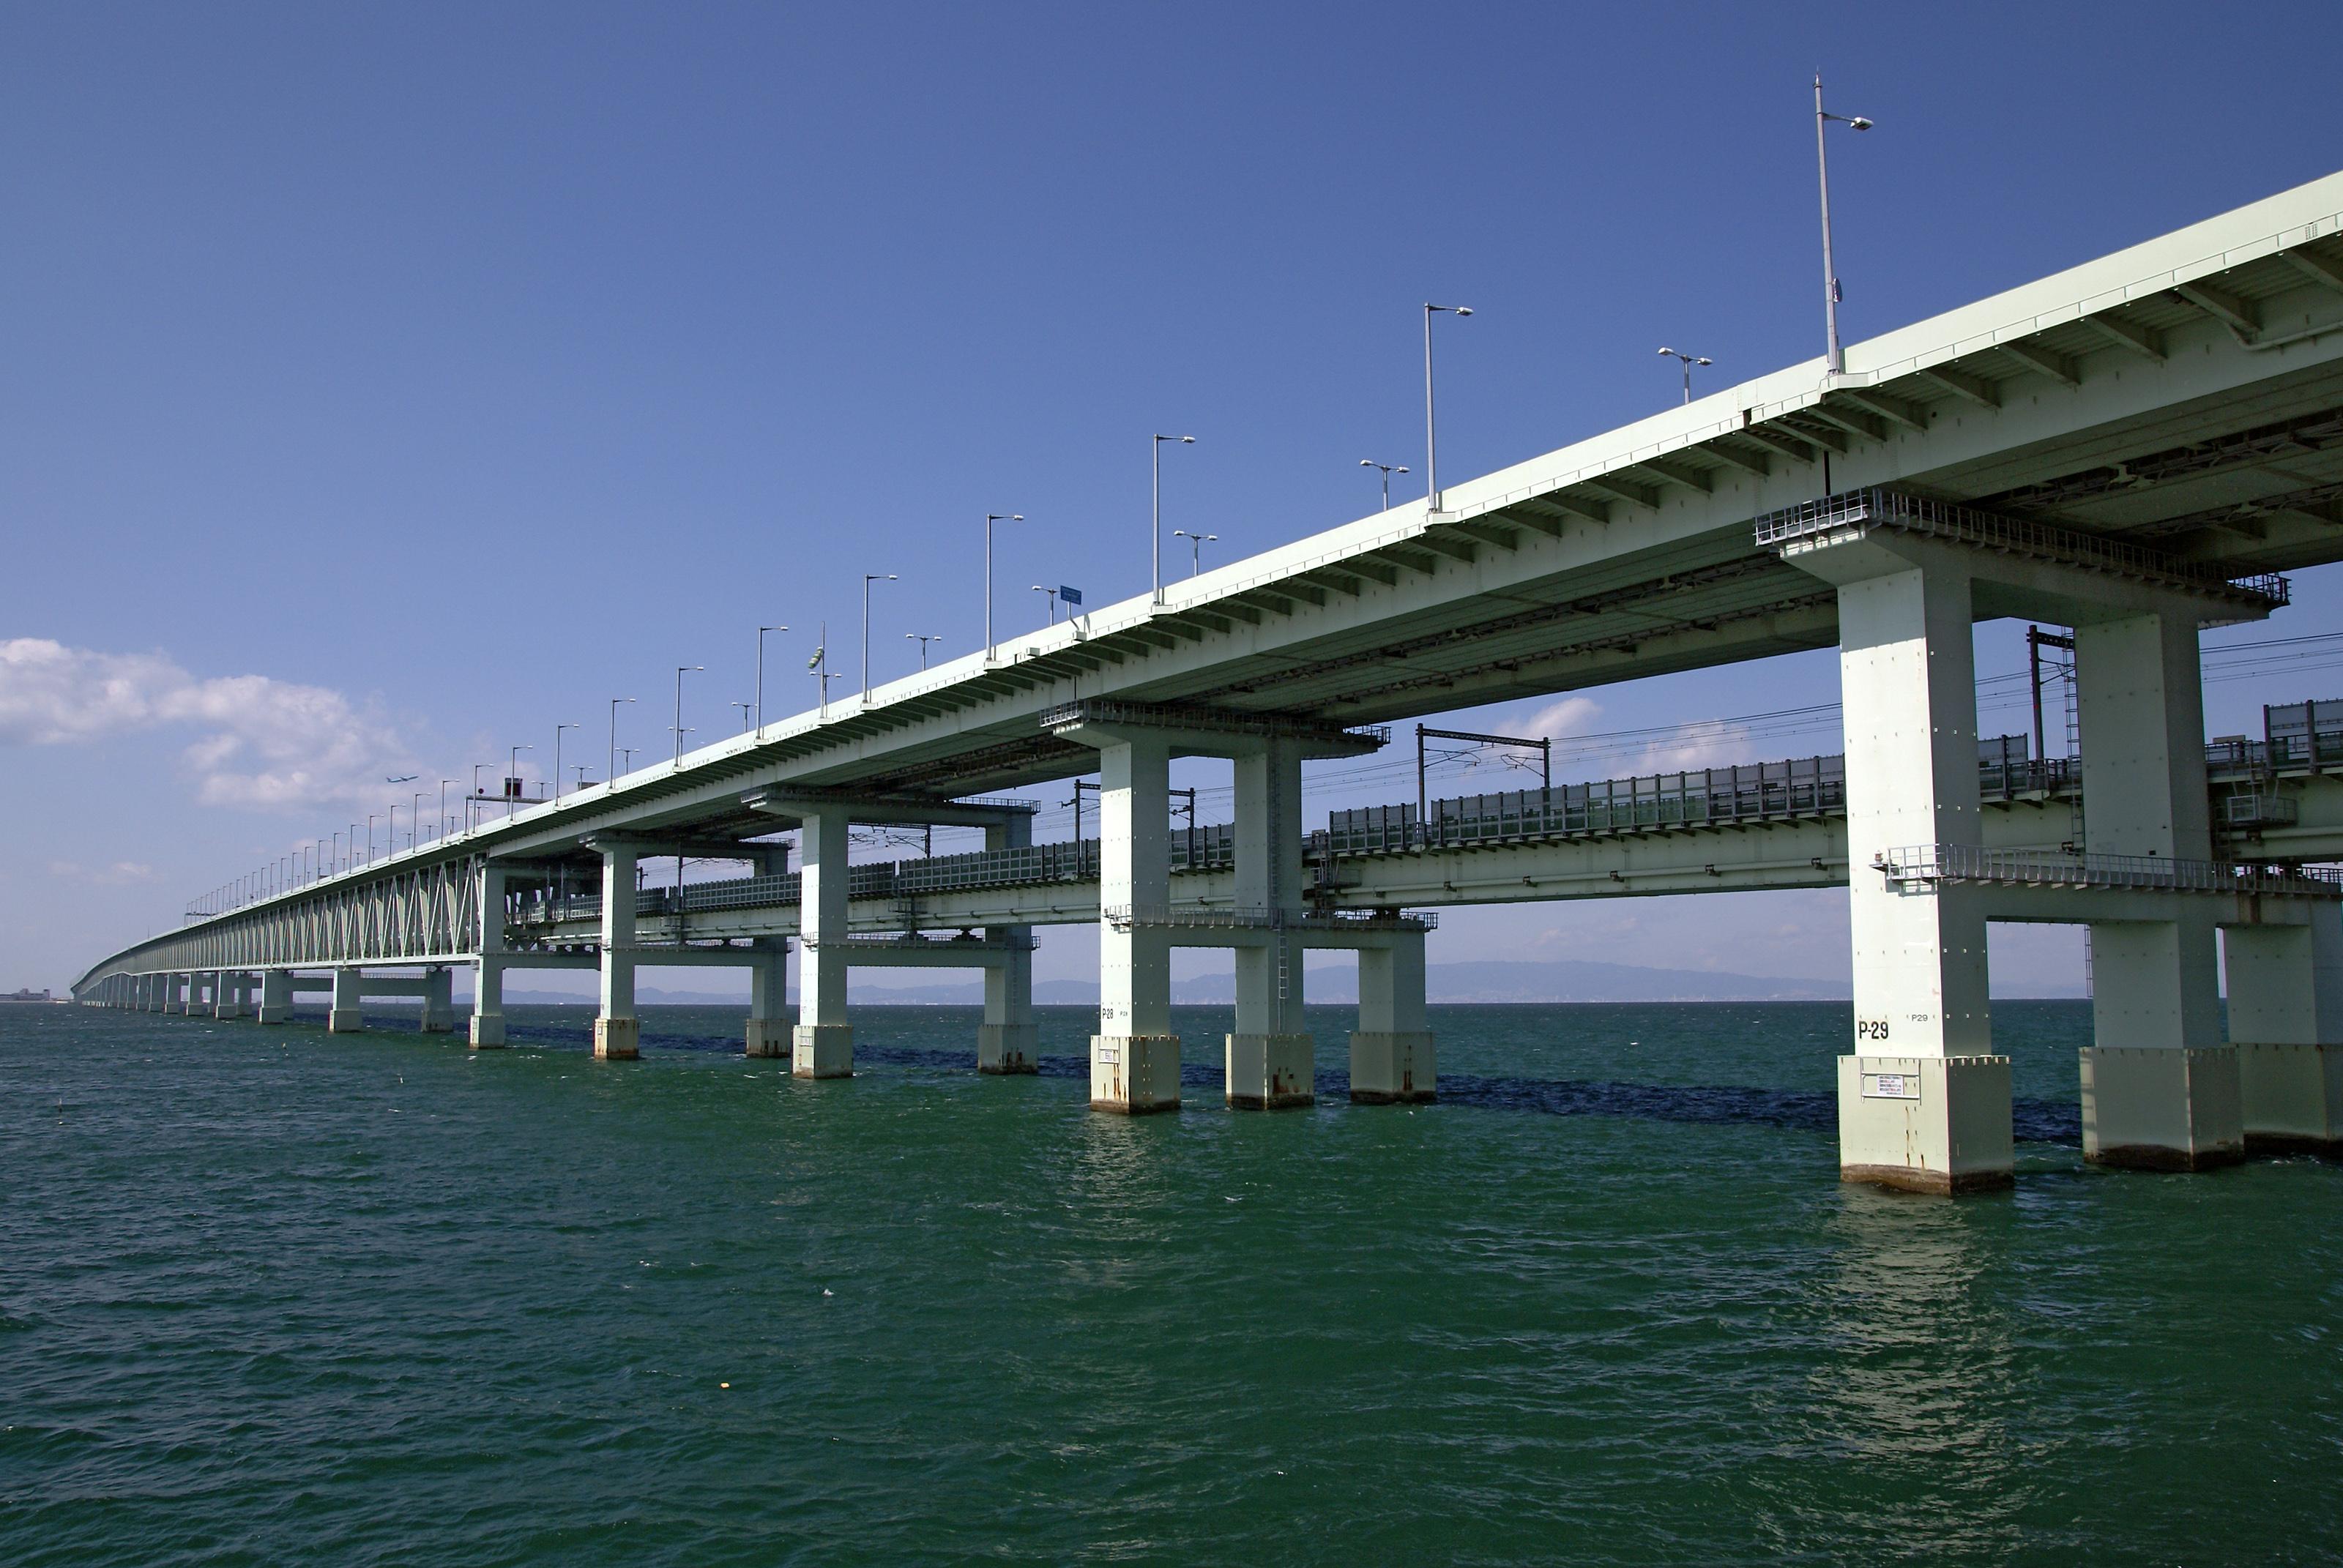 File:Sky gate bridge01s3200.jpg - Wikimedia Commons